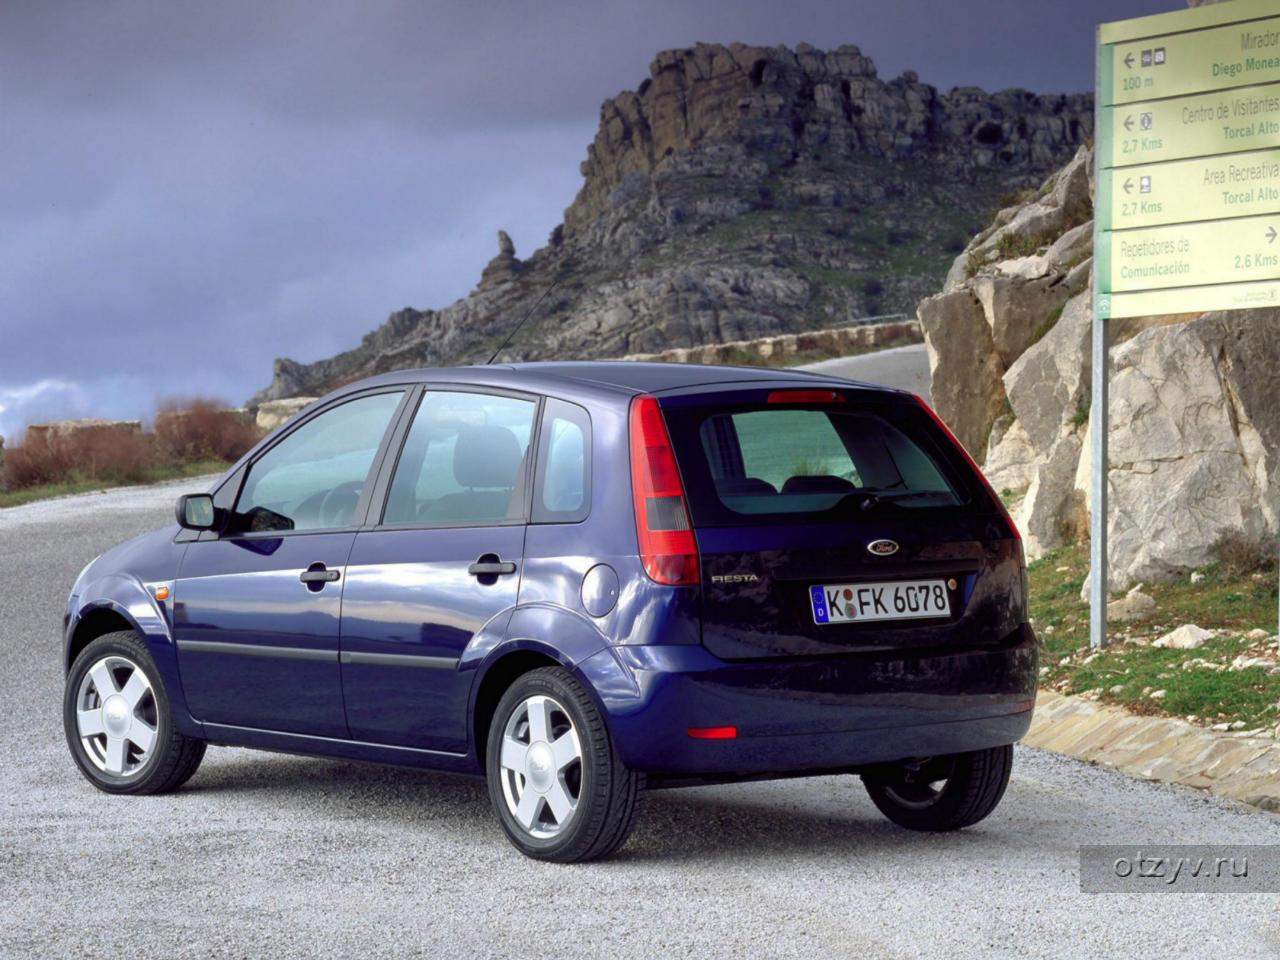 Ford Fiesta (Форд Фиеста) - Продажа, Цены, Отзывы, Фото ...